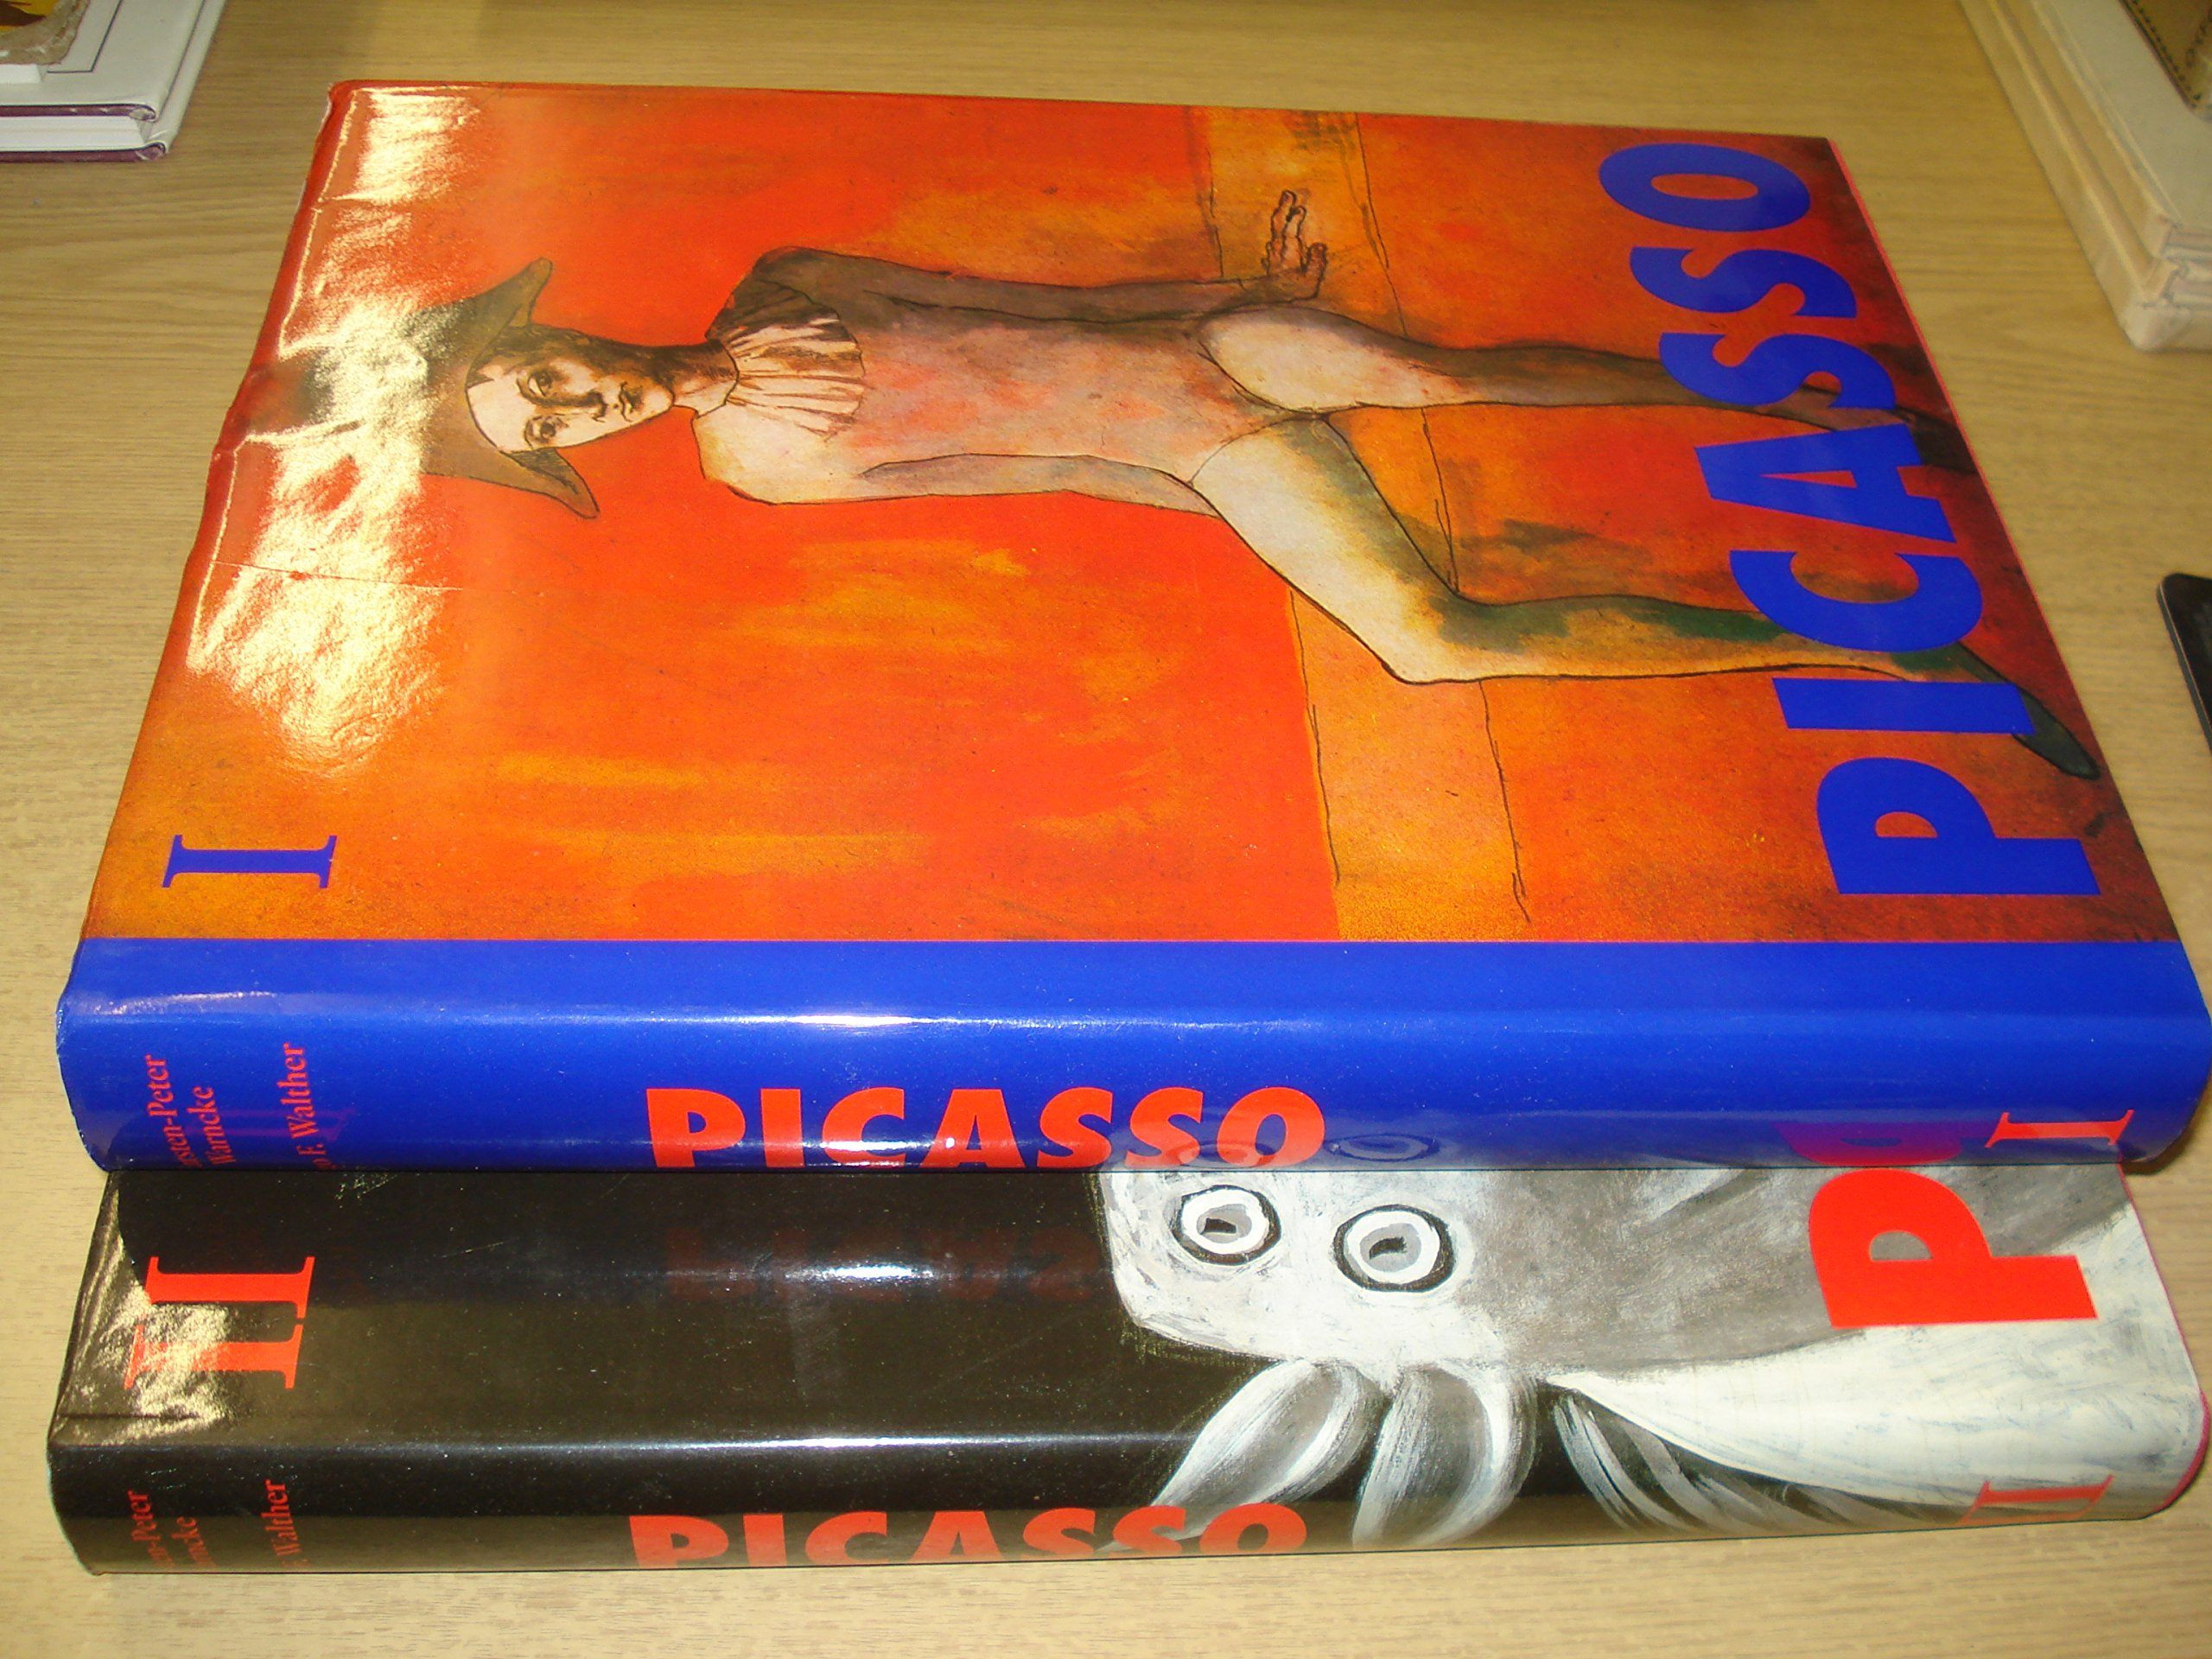 pablo picasso 1881 1973 dutch edition